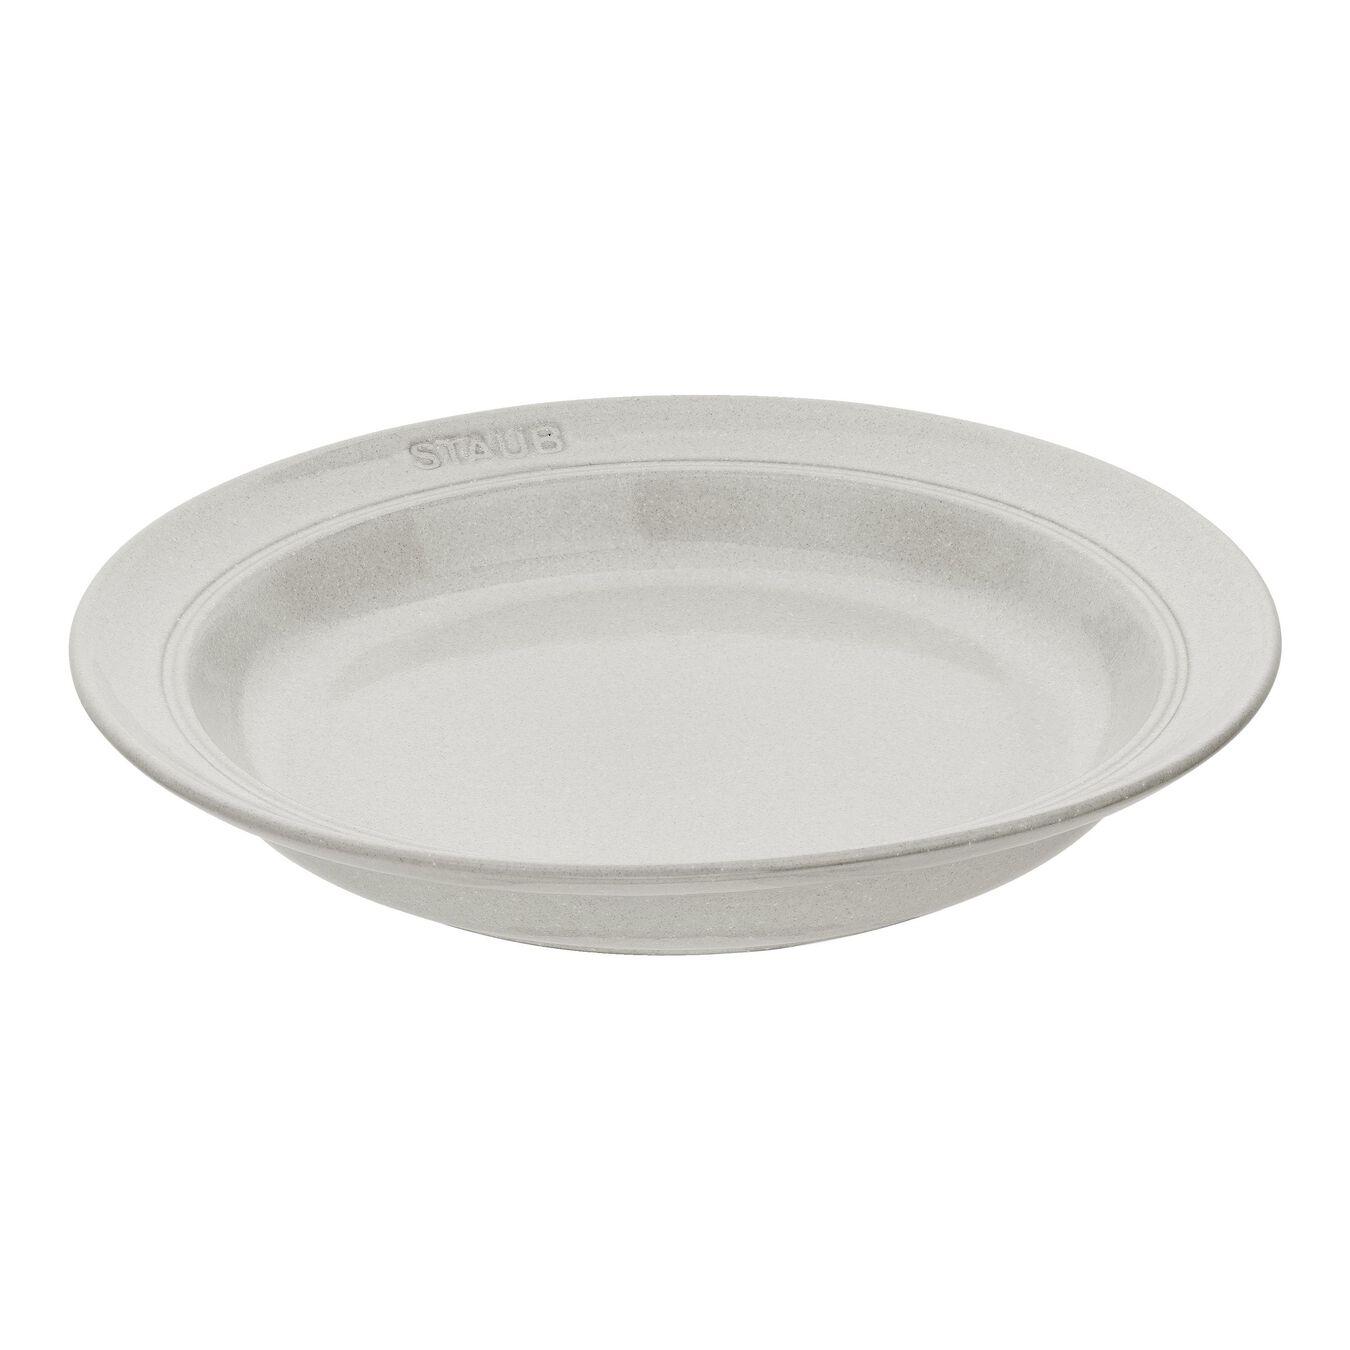 Pasta plate set, 4 Piece   white truffle   Ceramic   round   Ceramic,,large 1